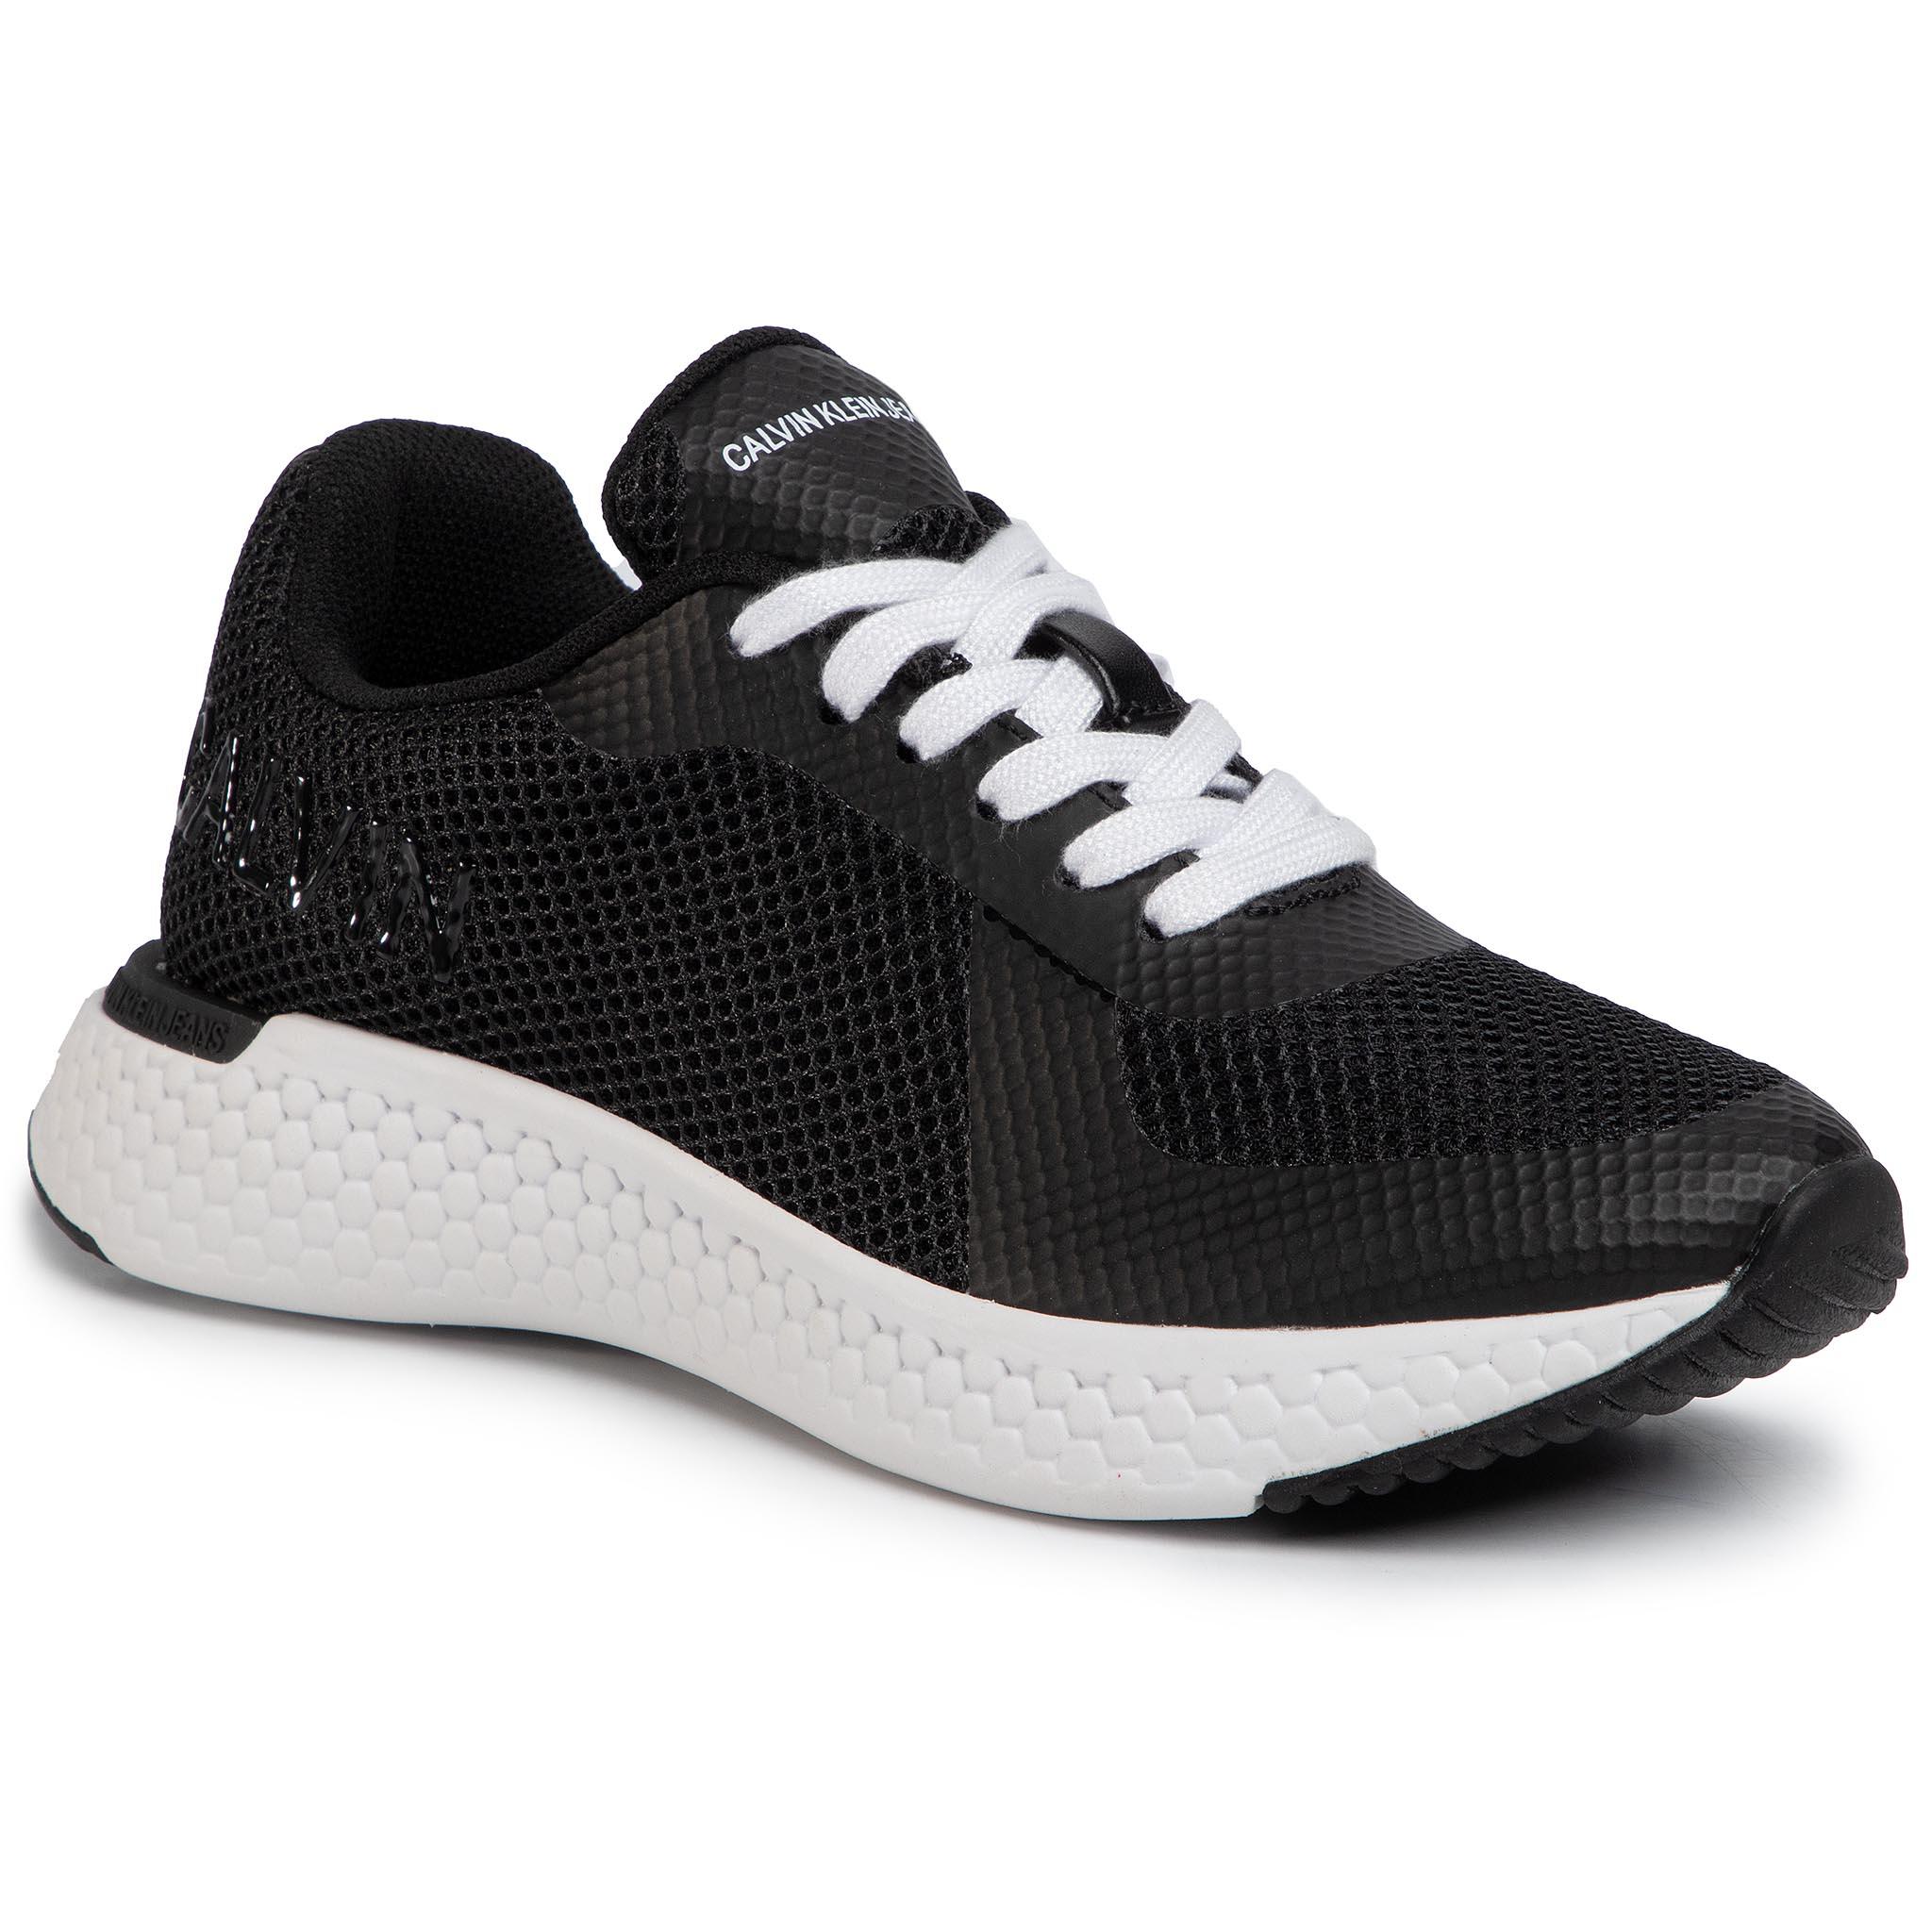 Image of Sneakers CALVIN KLEIN JEANS - Alma R7809 Black/Black